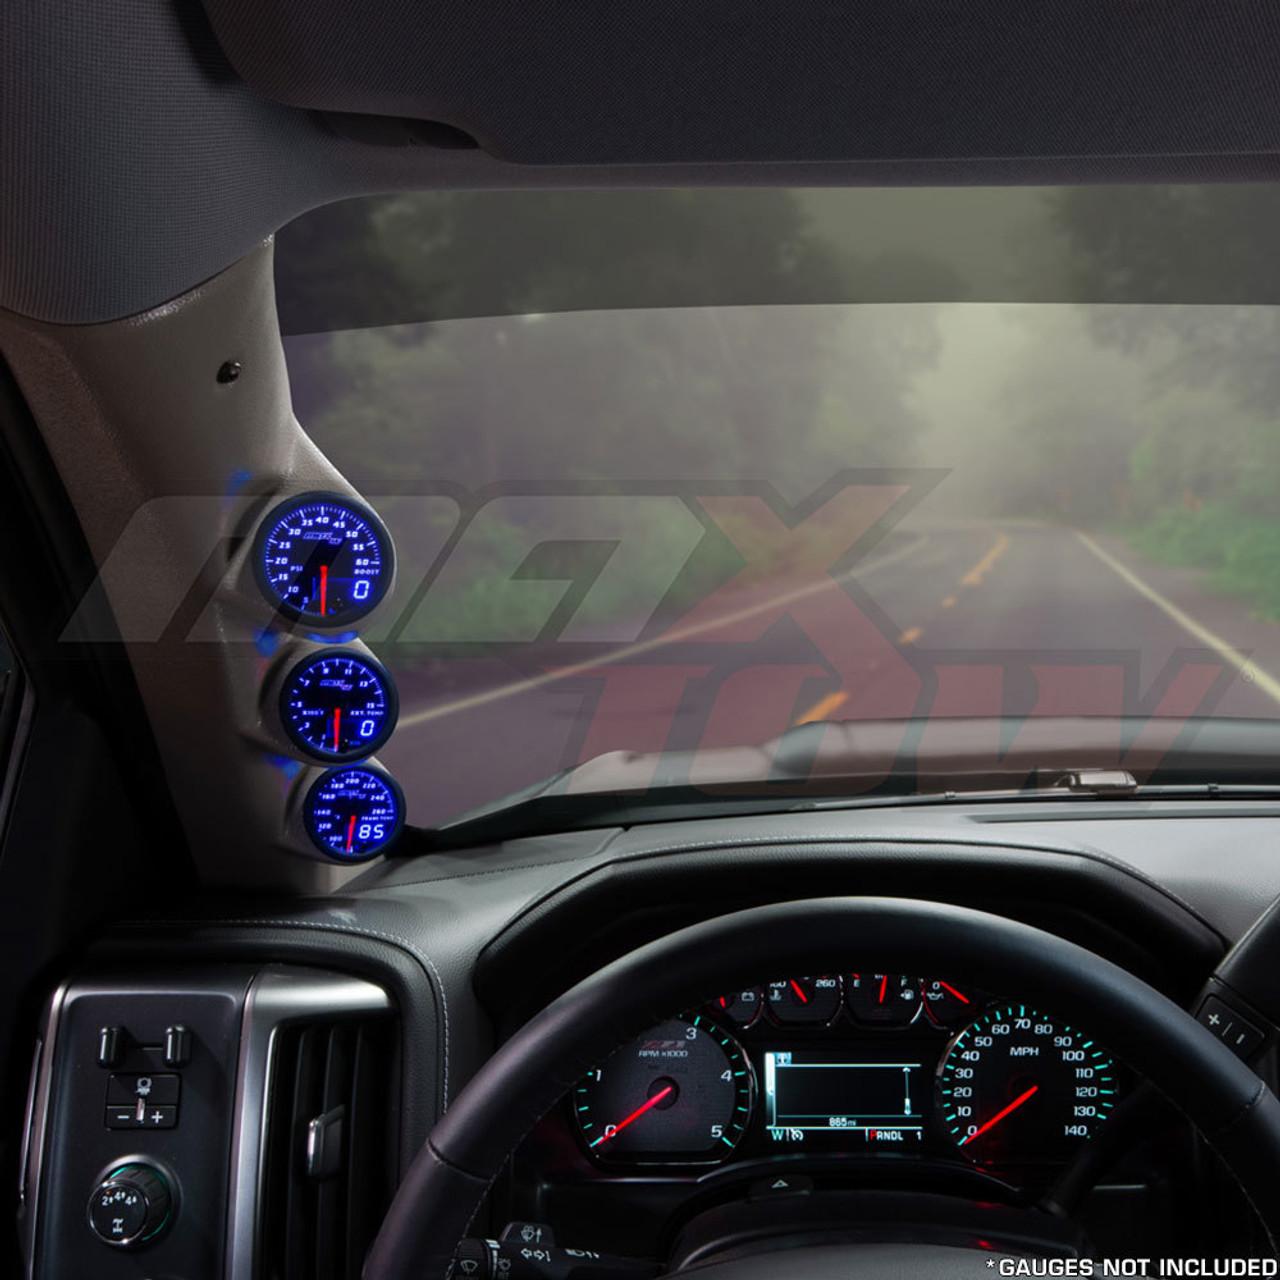 Aluminum Single Gauge Dash Mount Holder Panel Pod Fits Autometer P5 for Chevrolet Silverado 2500 HD